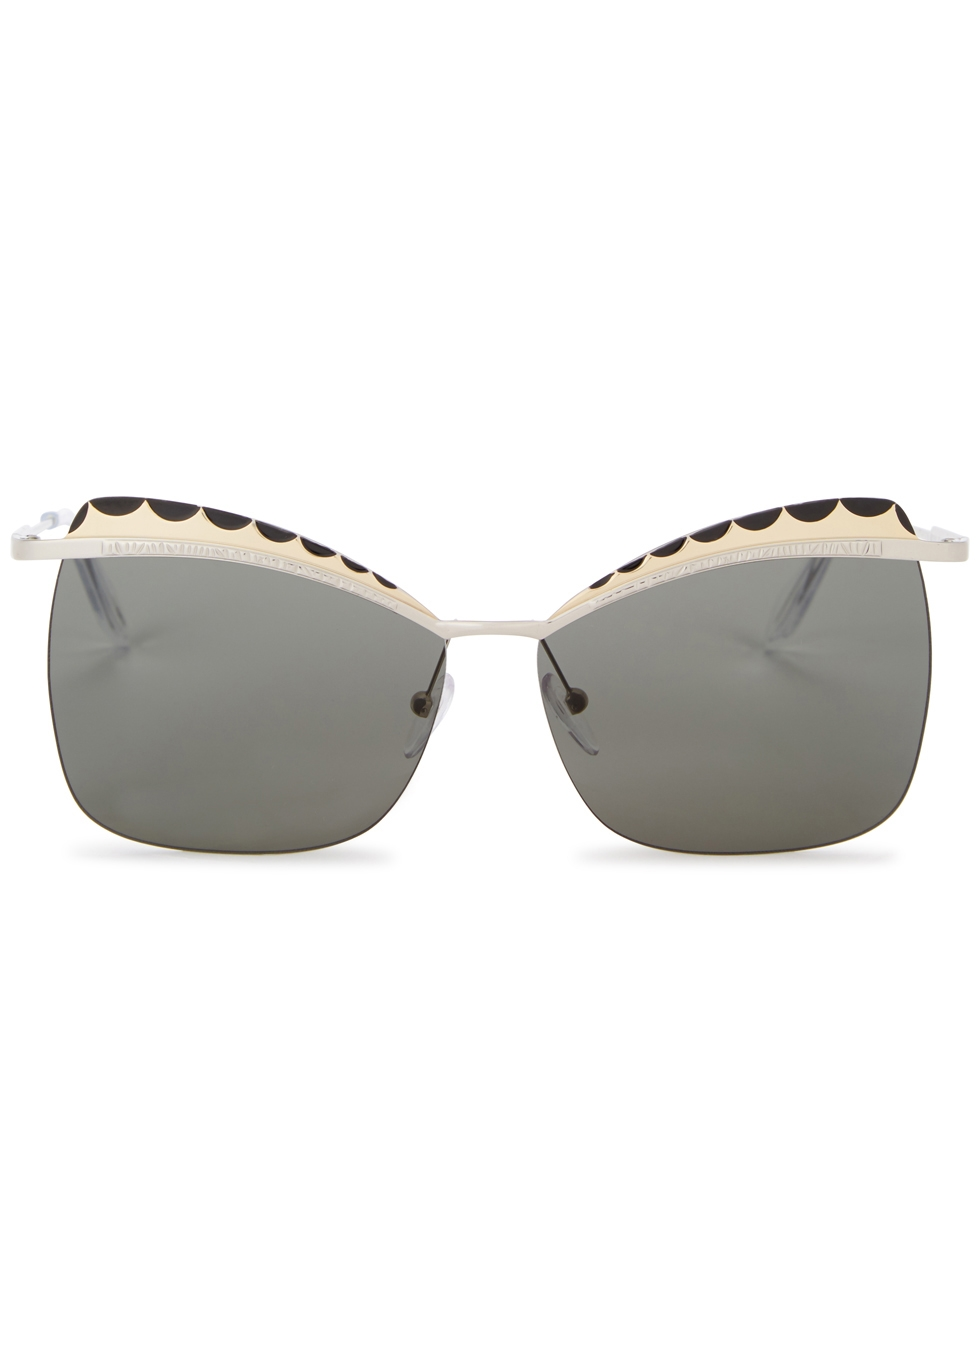 Silver tone butterfly-frame sunglasses - Alexander McQueen